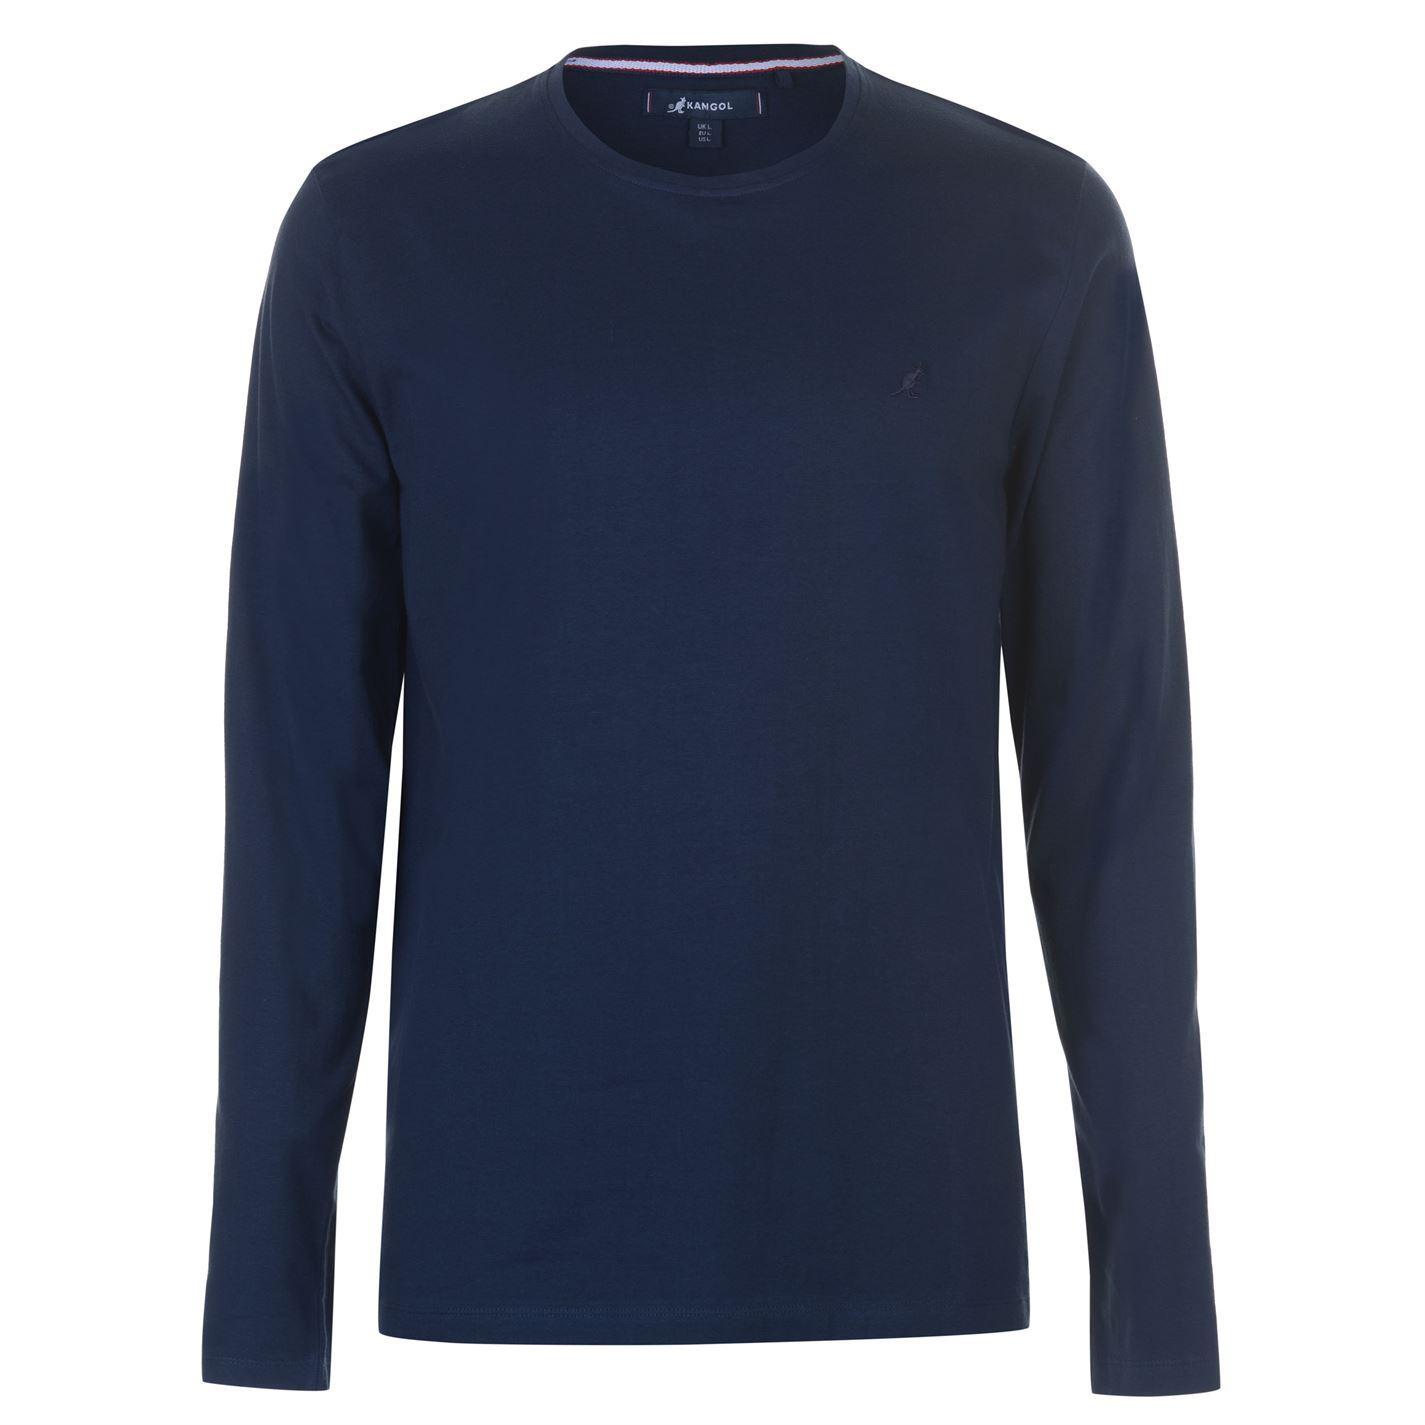 Kangol-Long-Sleeve-T-Shirt-Mens-Tee-Shirt-Top thumbnail 4